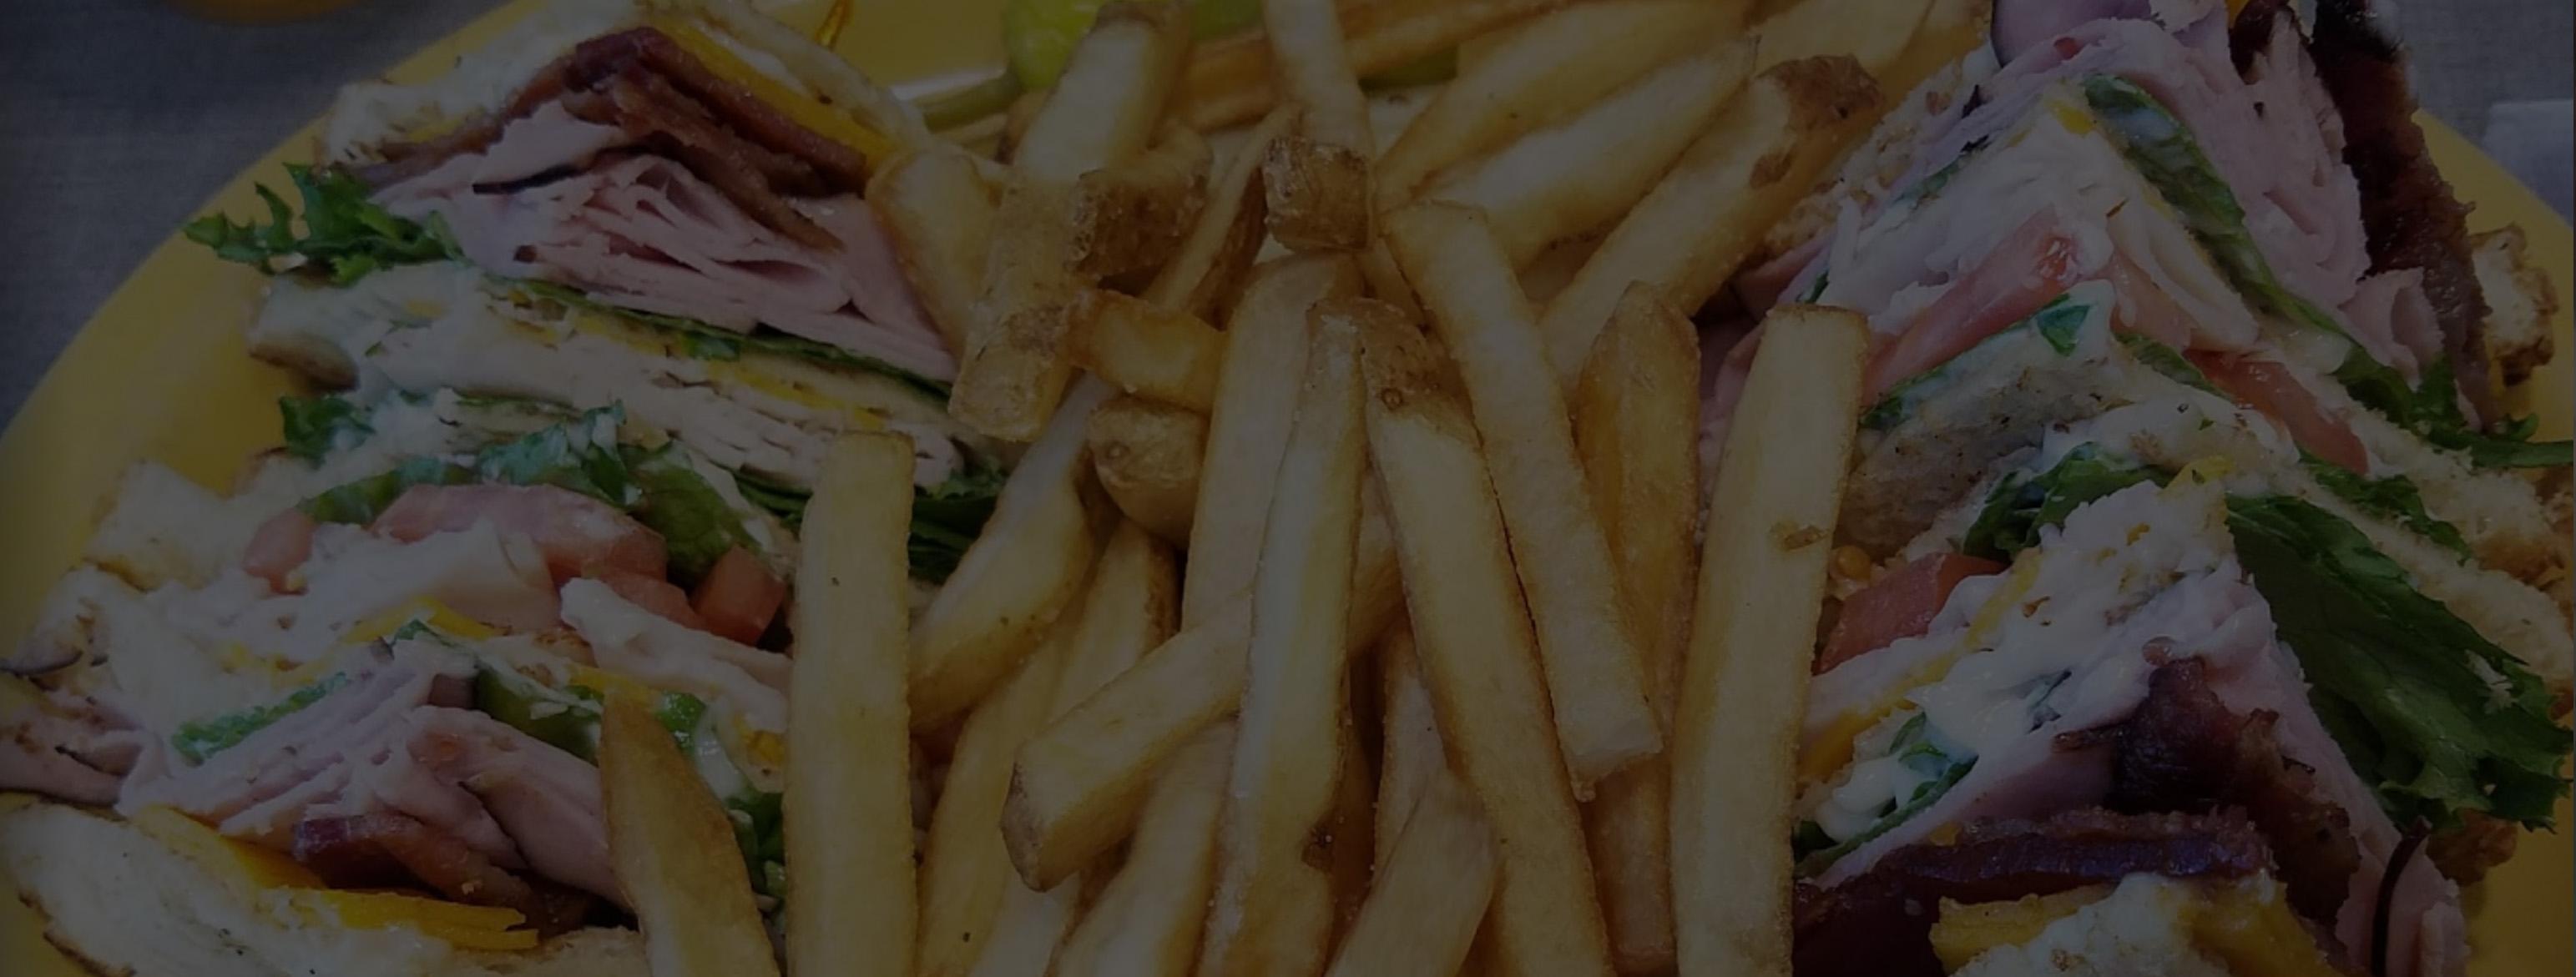 club sandwich and fries